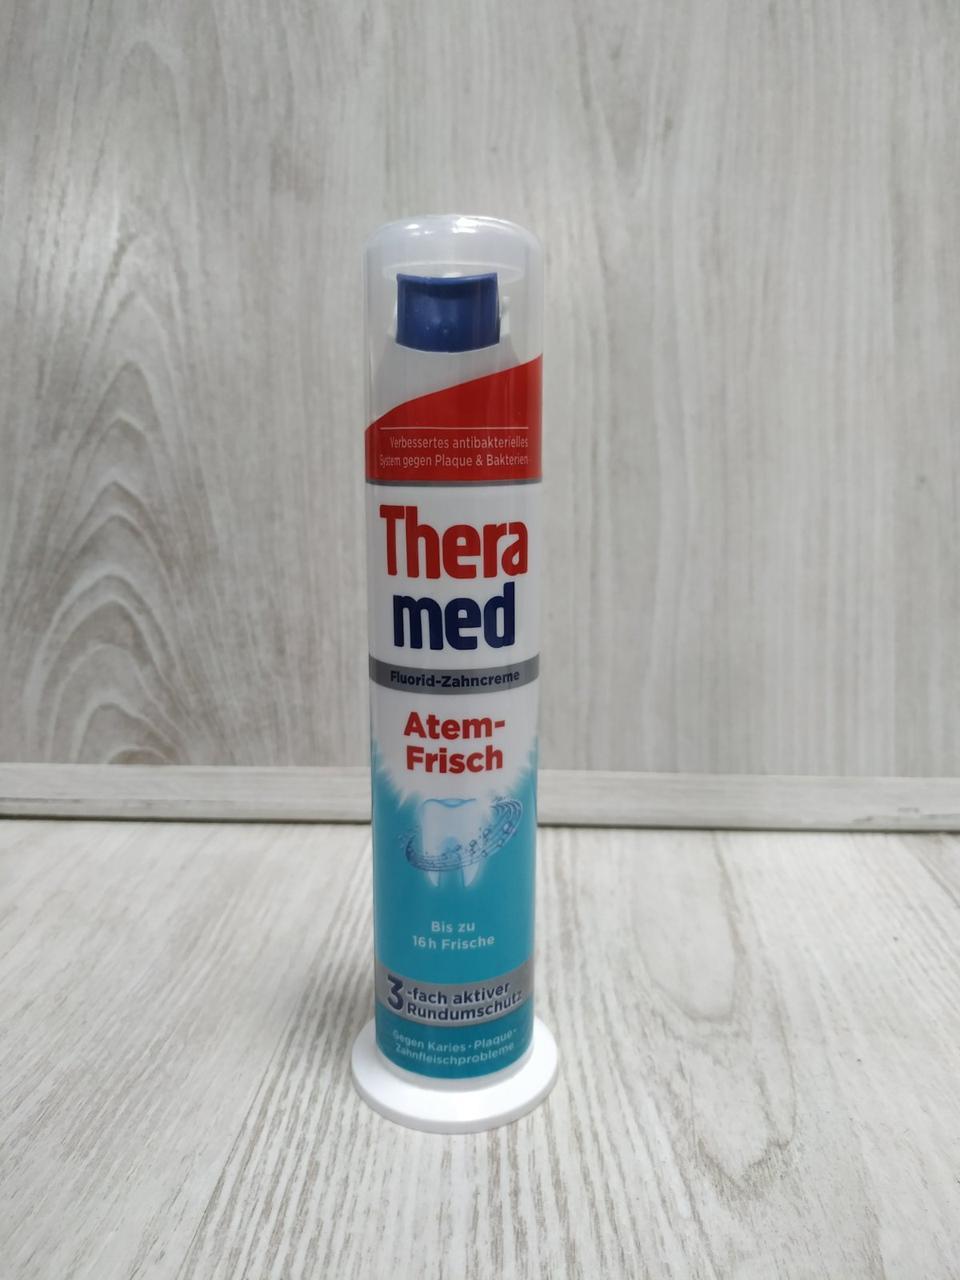 Theramed зубная паста (колба) 100 ml   Atem-Frisch